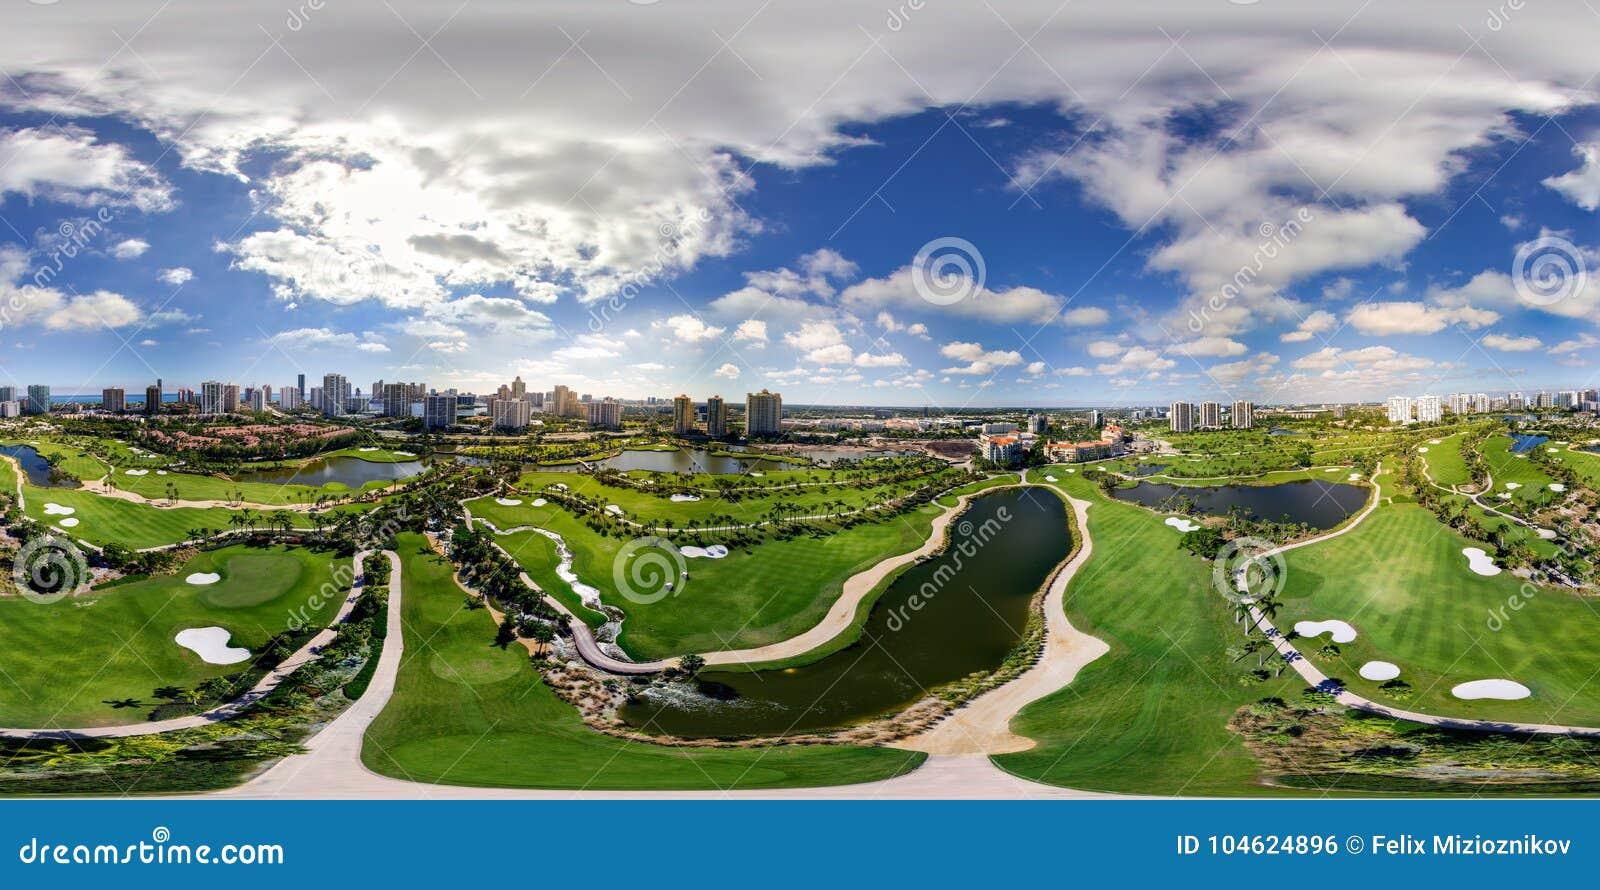 Aerial Drone Image Spherical Equirectangular Panorama